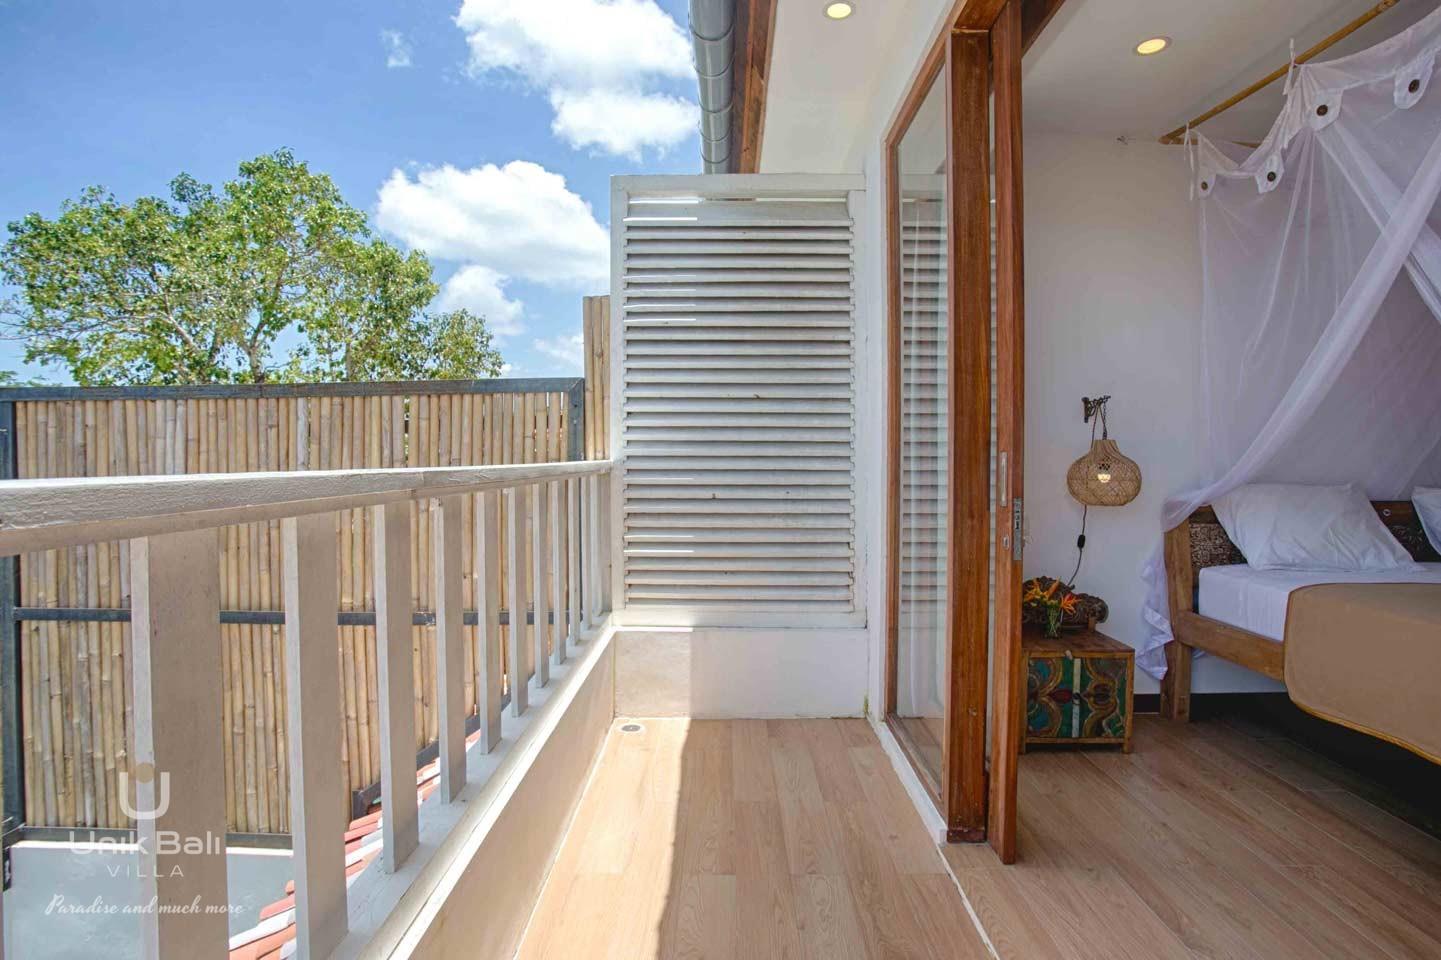 unik-bali-for-rent-shiva-bali-balcony-bedroom-2